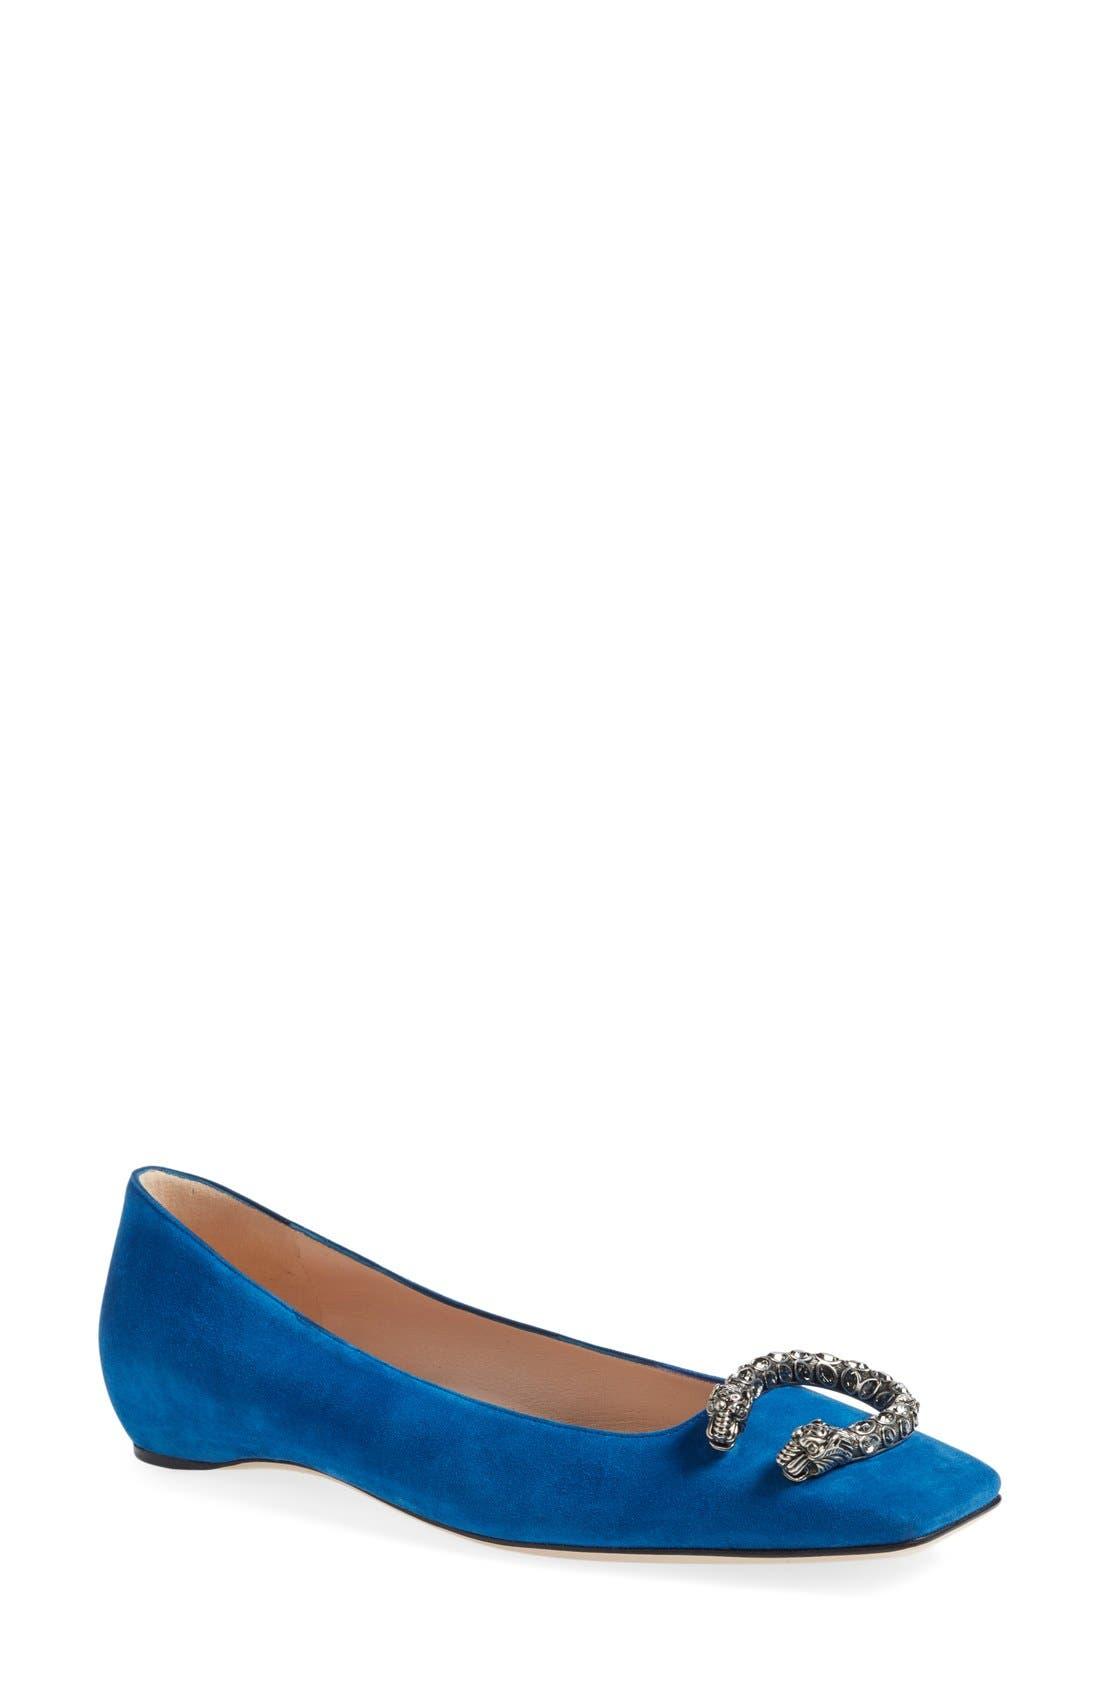 Gucci Dionysus Embellished Square Toe Flat (Women)